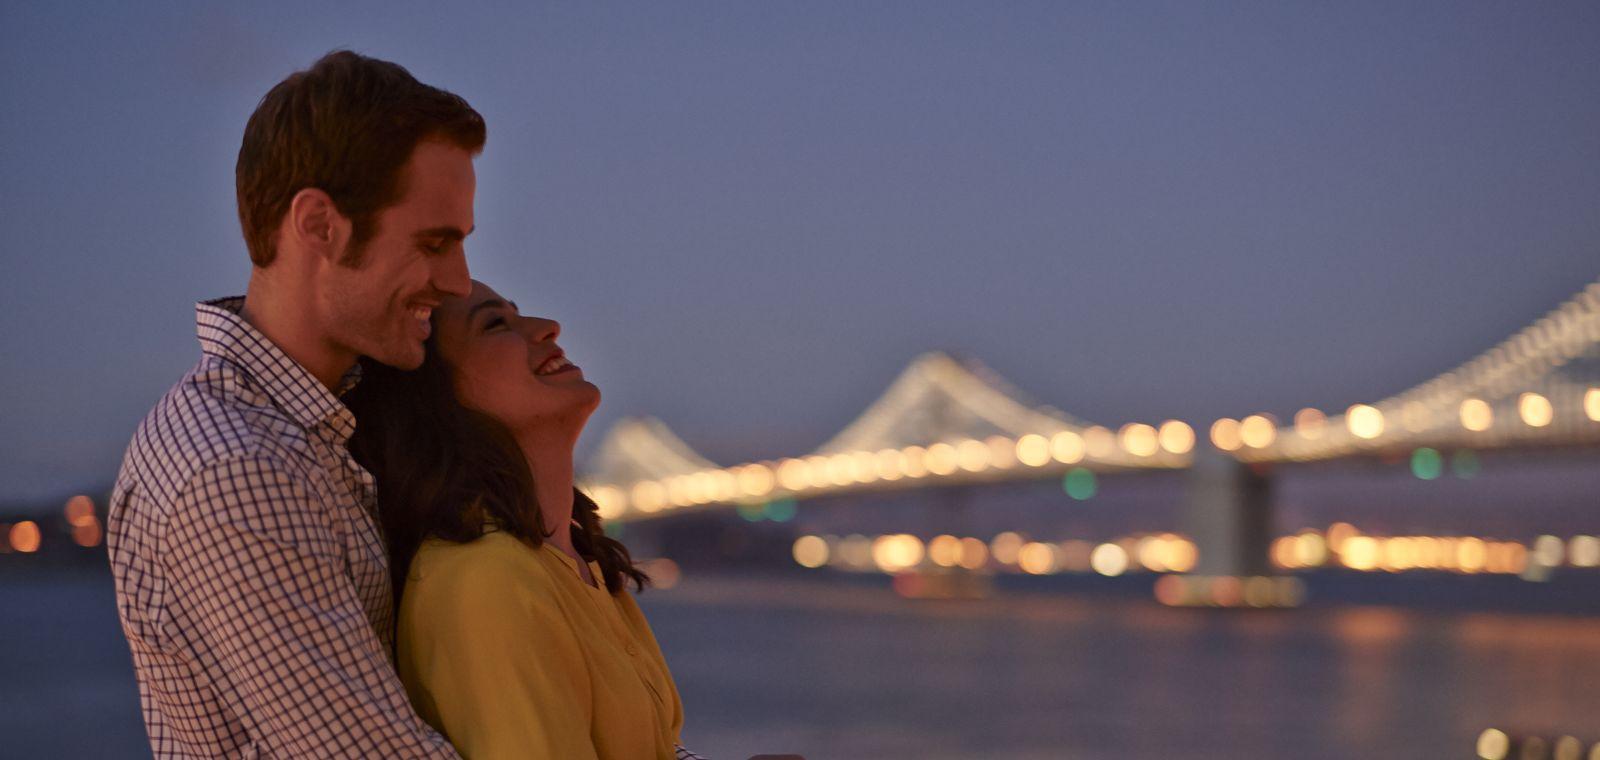 JDV Lifestyle City Couple Vitale 02